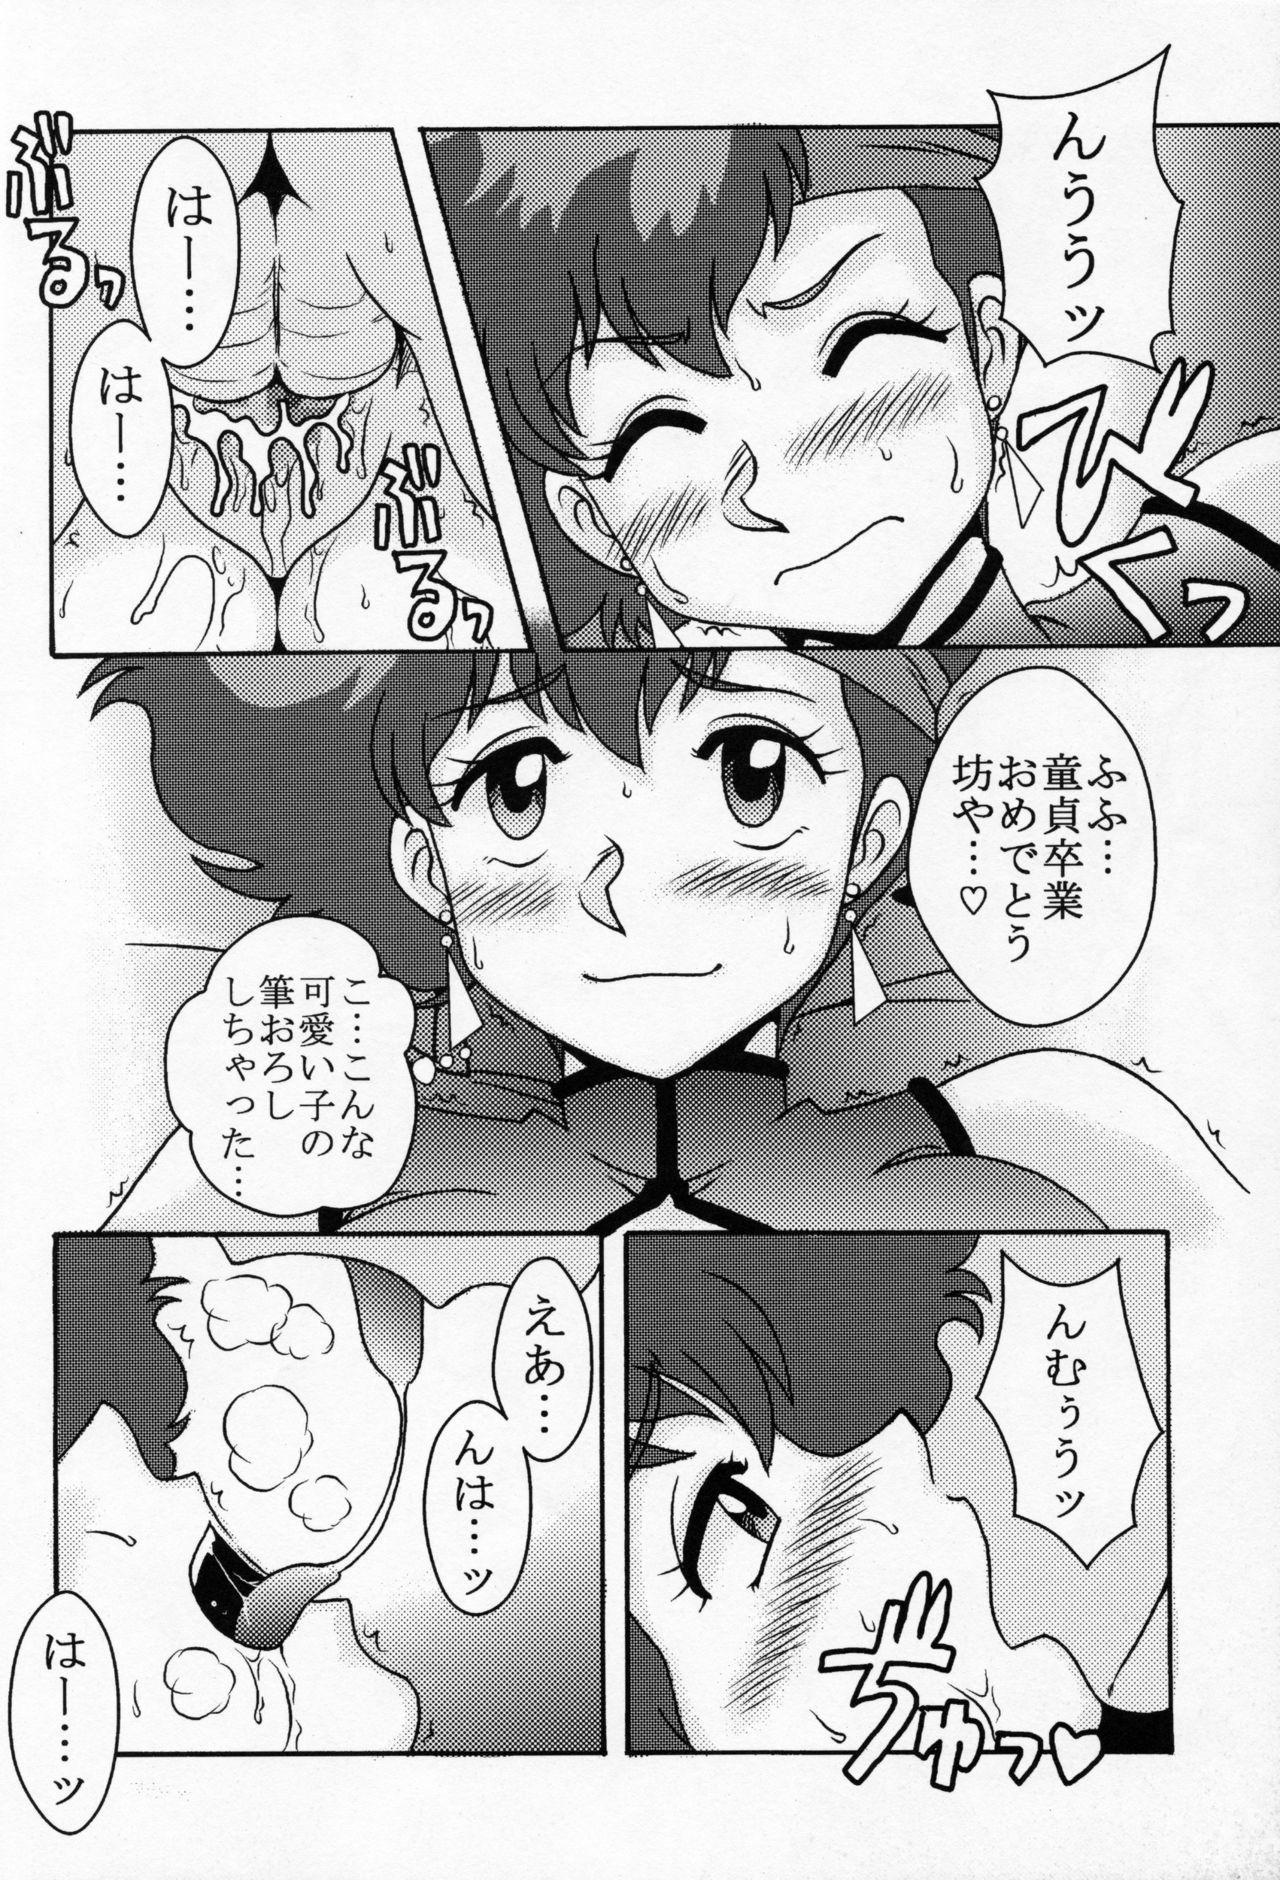 Kei to Yuri 14